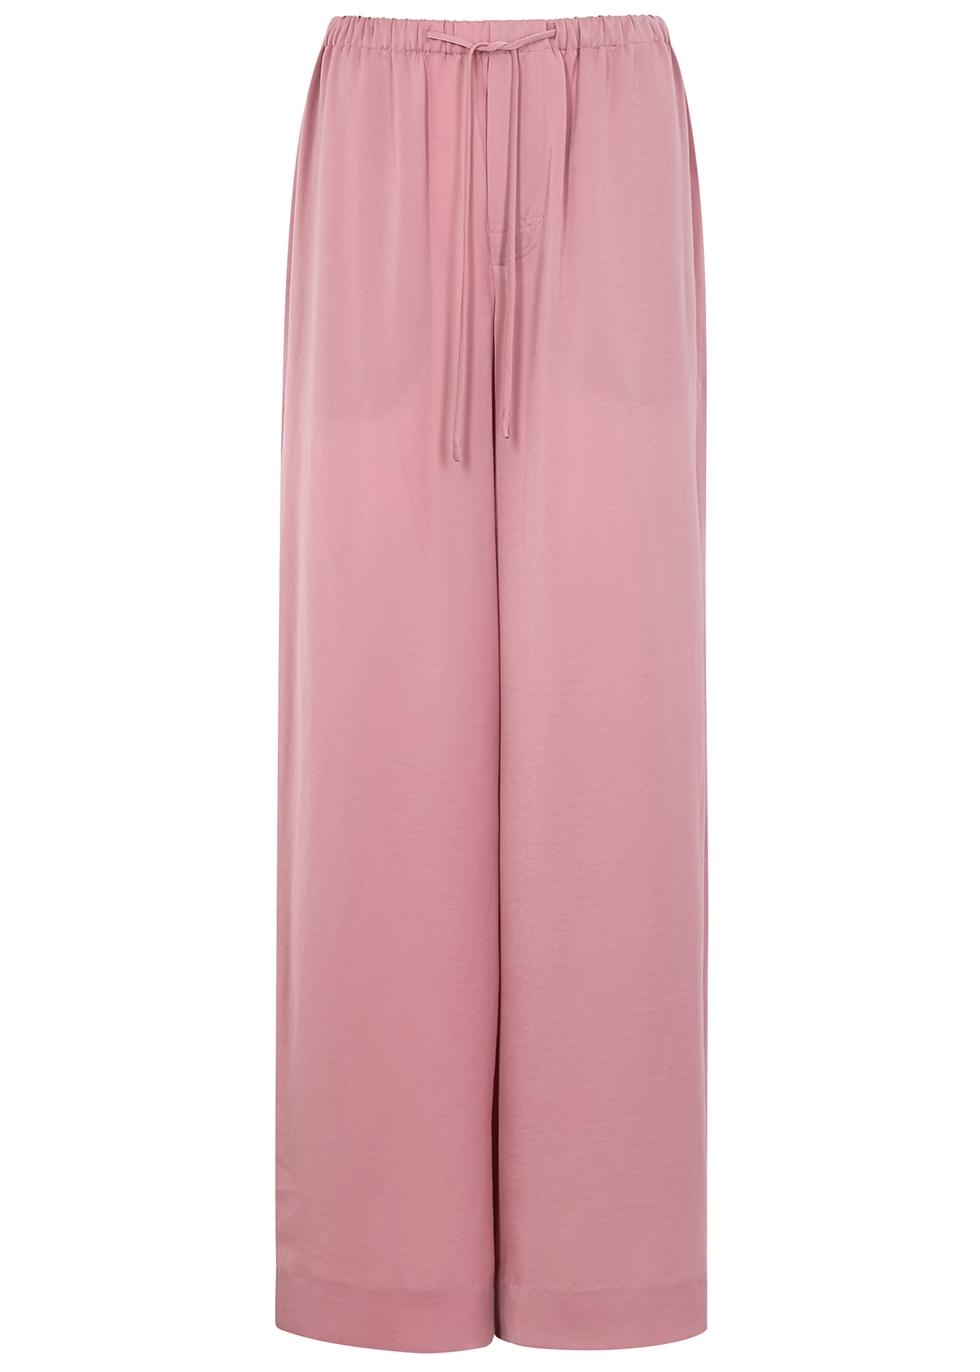 997627eeb6b087 Vince Rose wide-leg satin trousers - Harvey Nichols